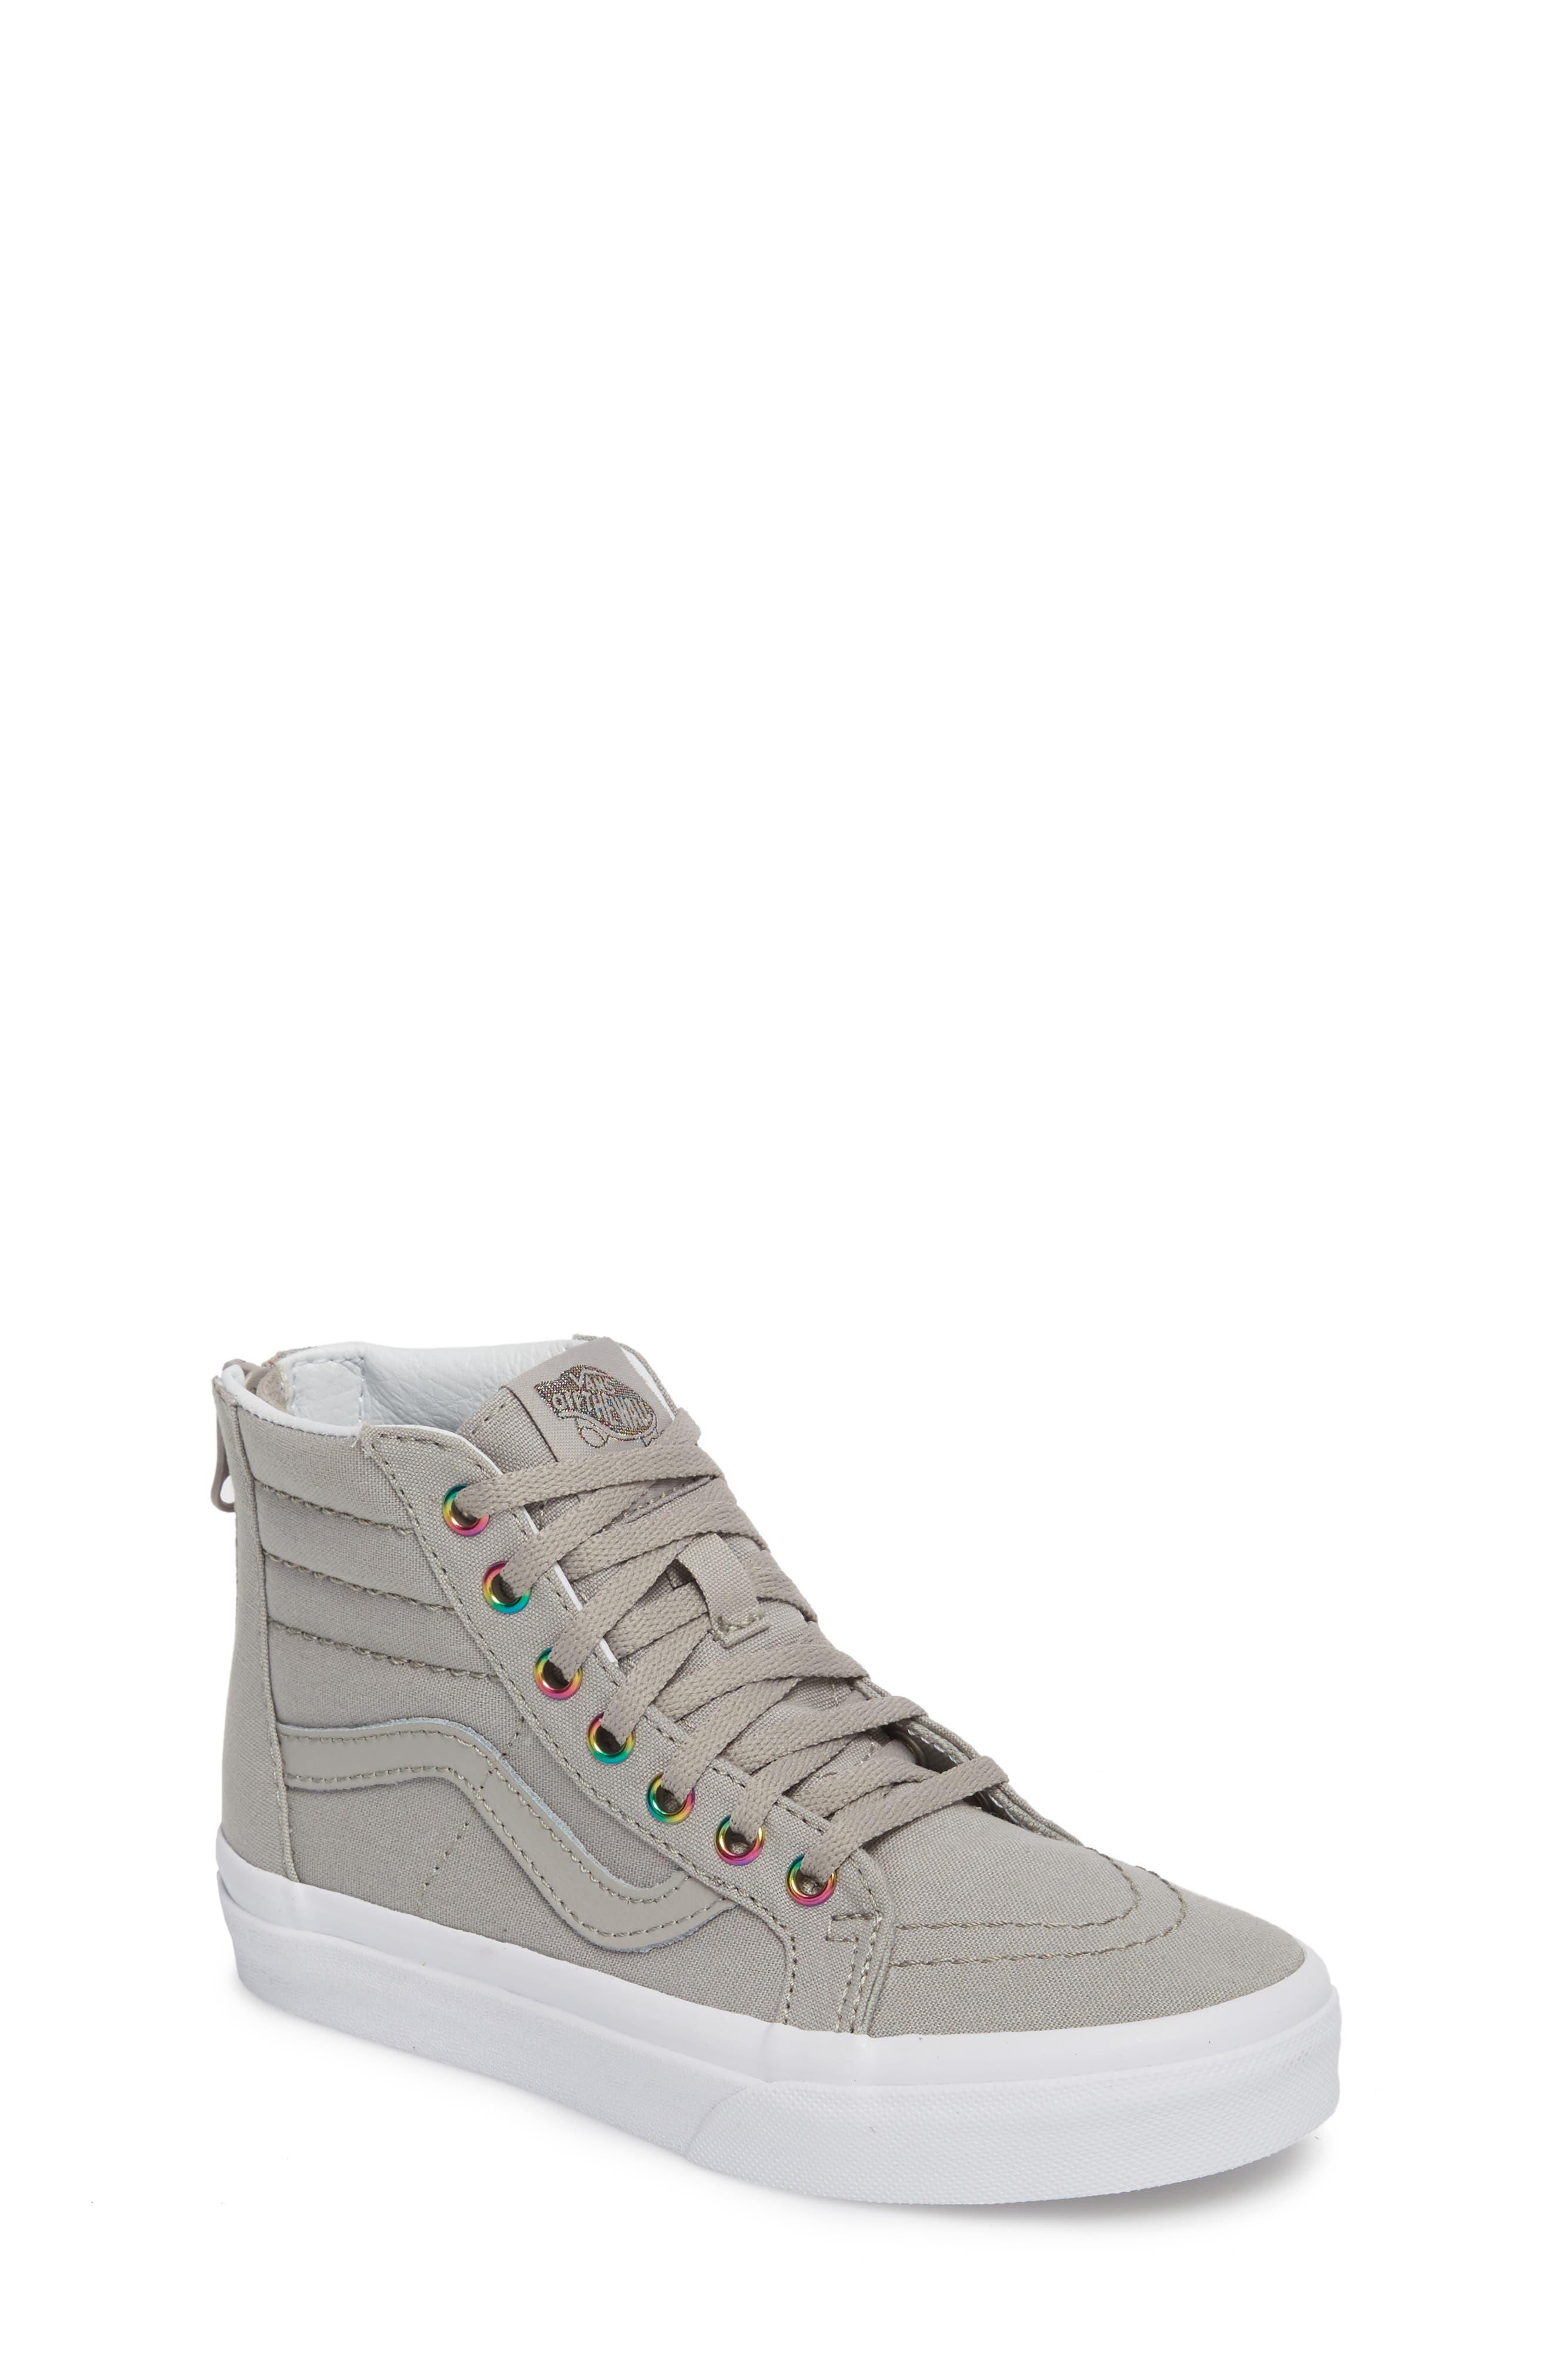 Sk8-Hi Zip High Top Sneaker,                         Main,                         color, Rainbow Eyelet Drizzle